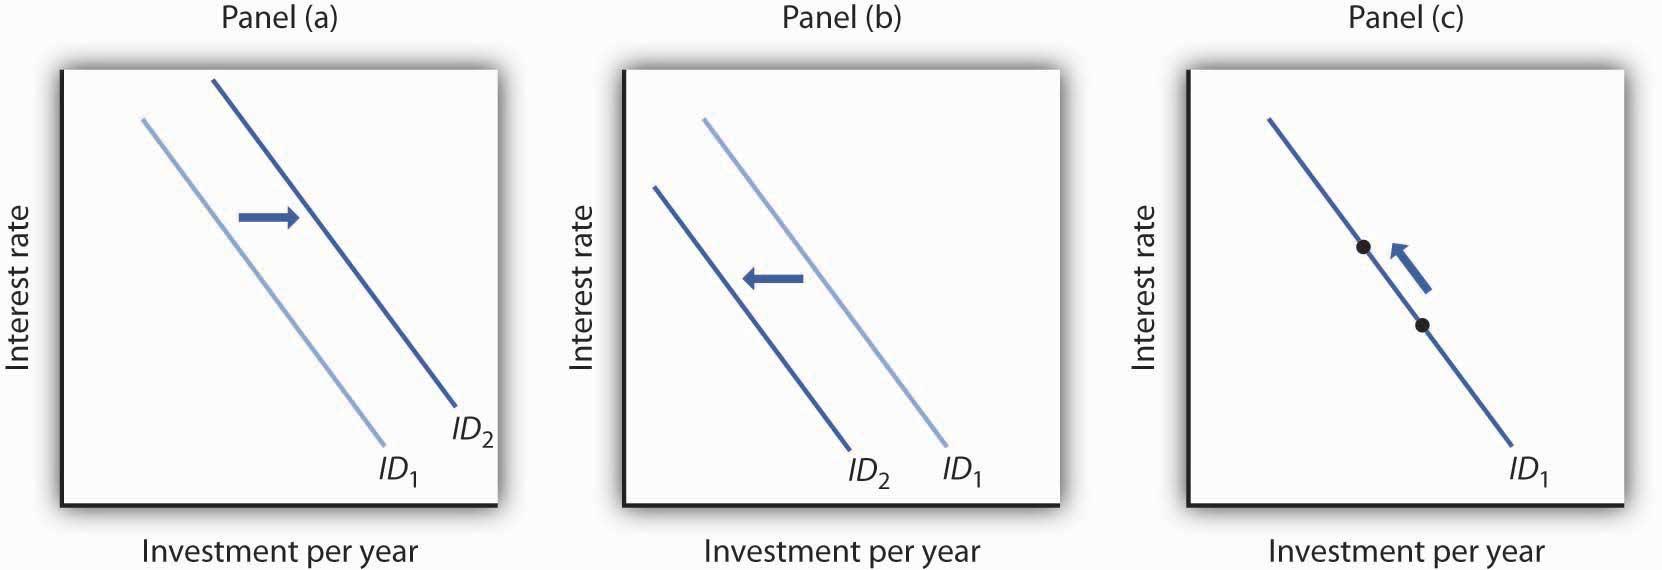 principles of macroeconomics v1 0 flatworld. Black Bedroom Furniture Sets. Home Design Ideas